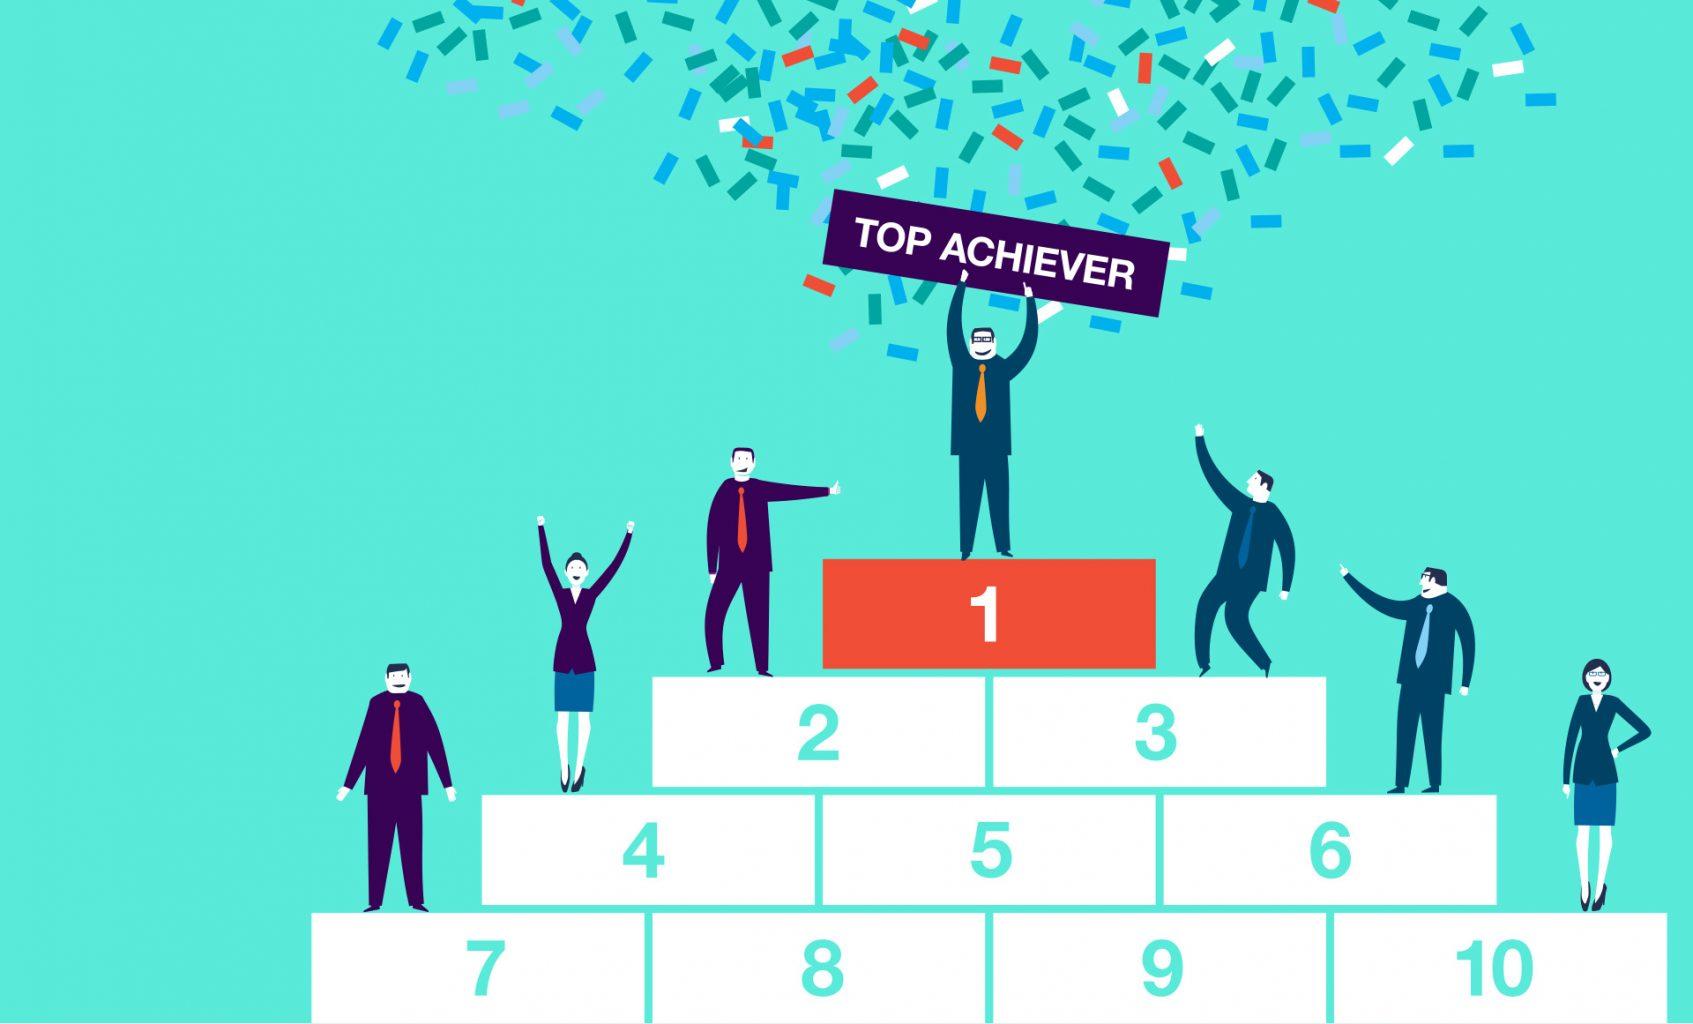 KYI IBM Top Achiever